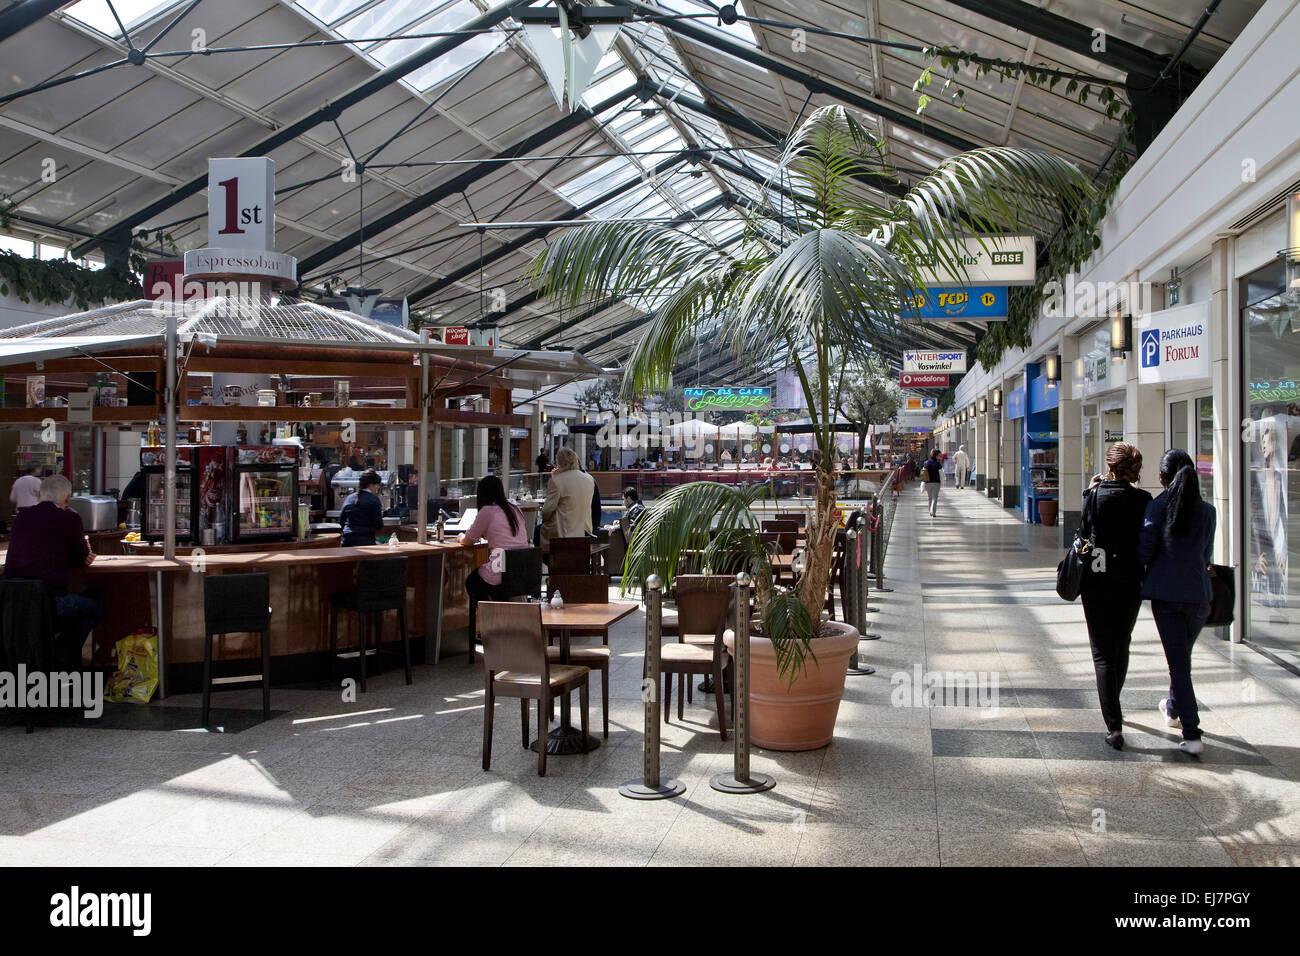 Forum Shopping Centre, Muelheim, Germany - Stock Image